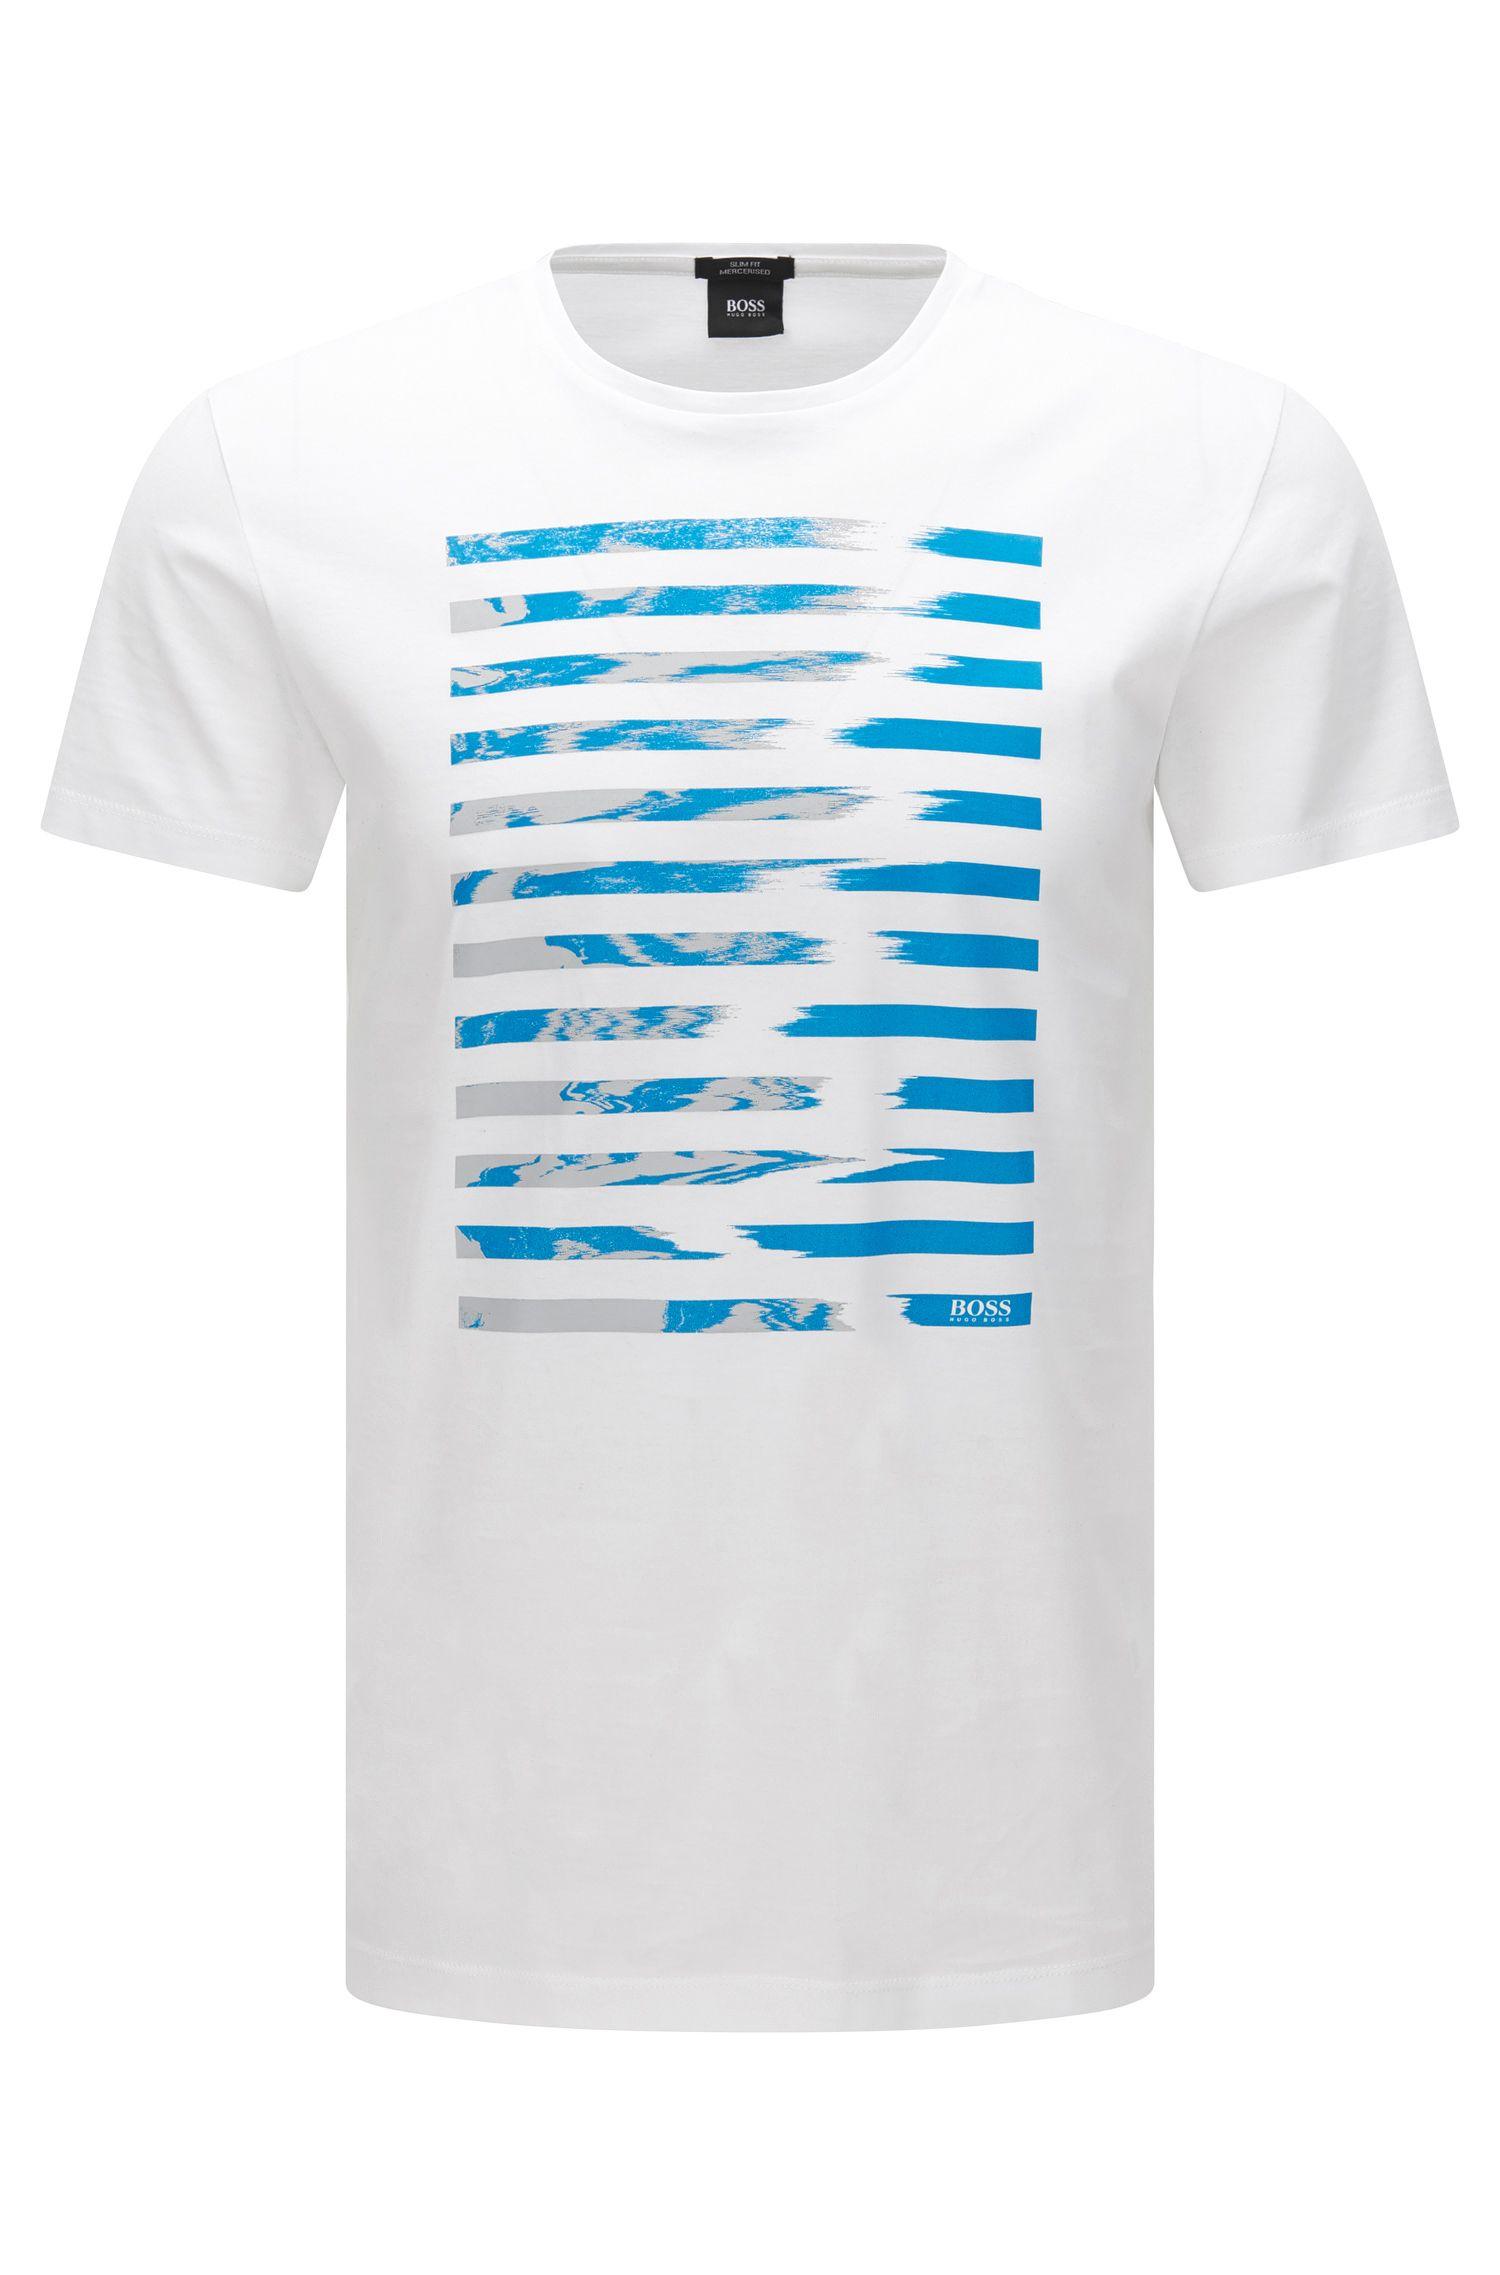 Slim-fit mercerised cotton T-shirt with graphic print